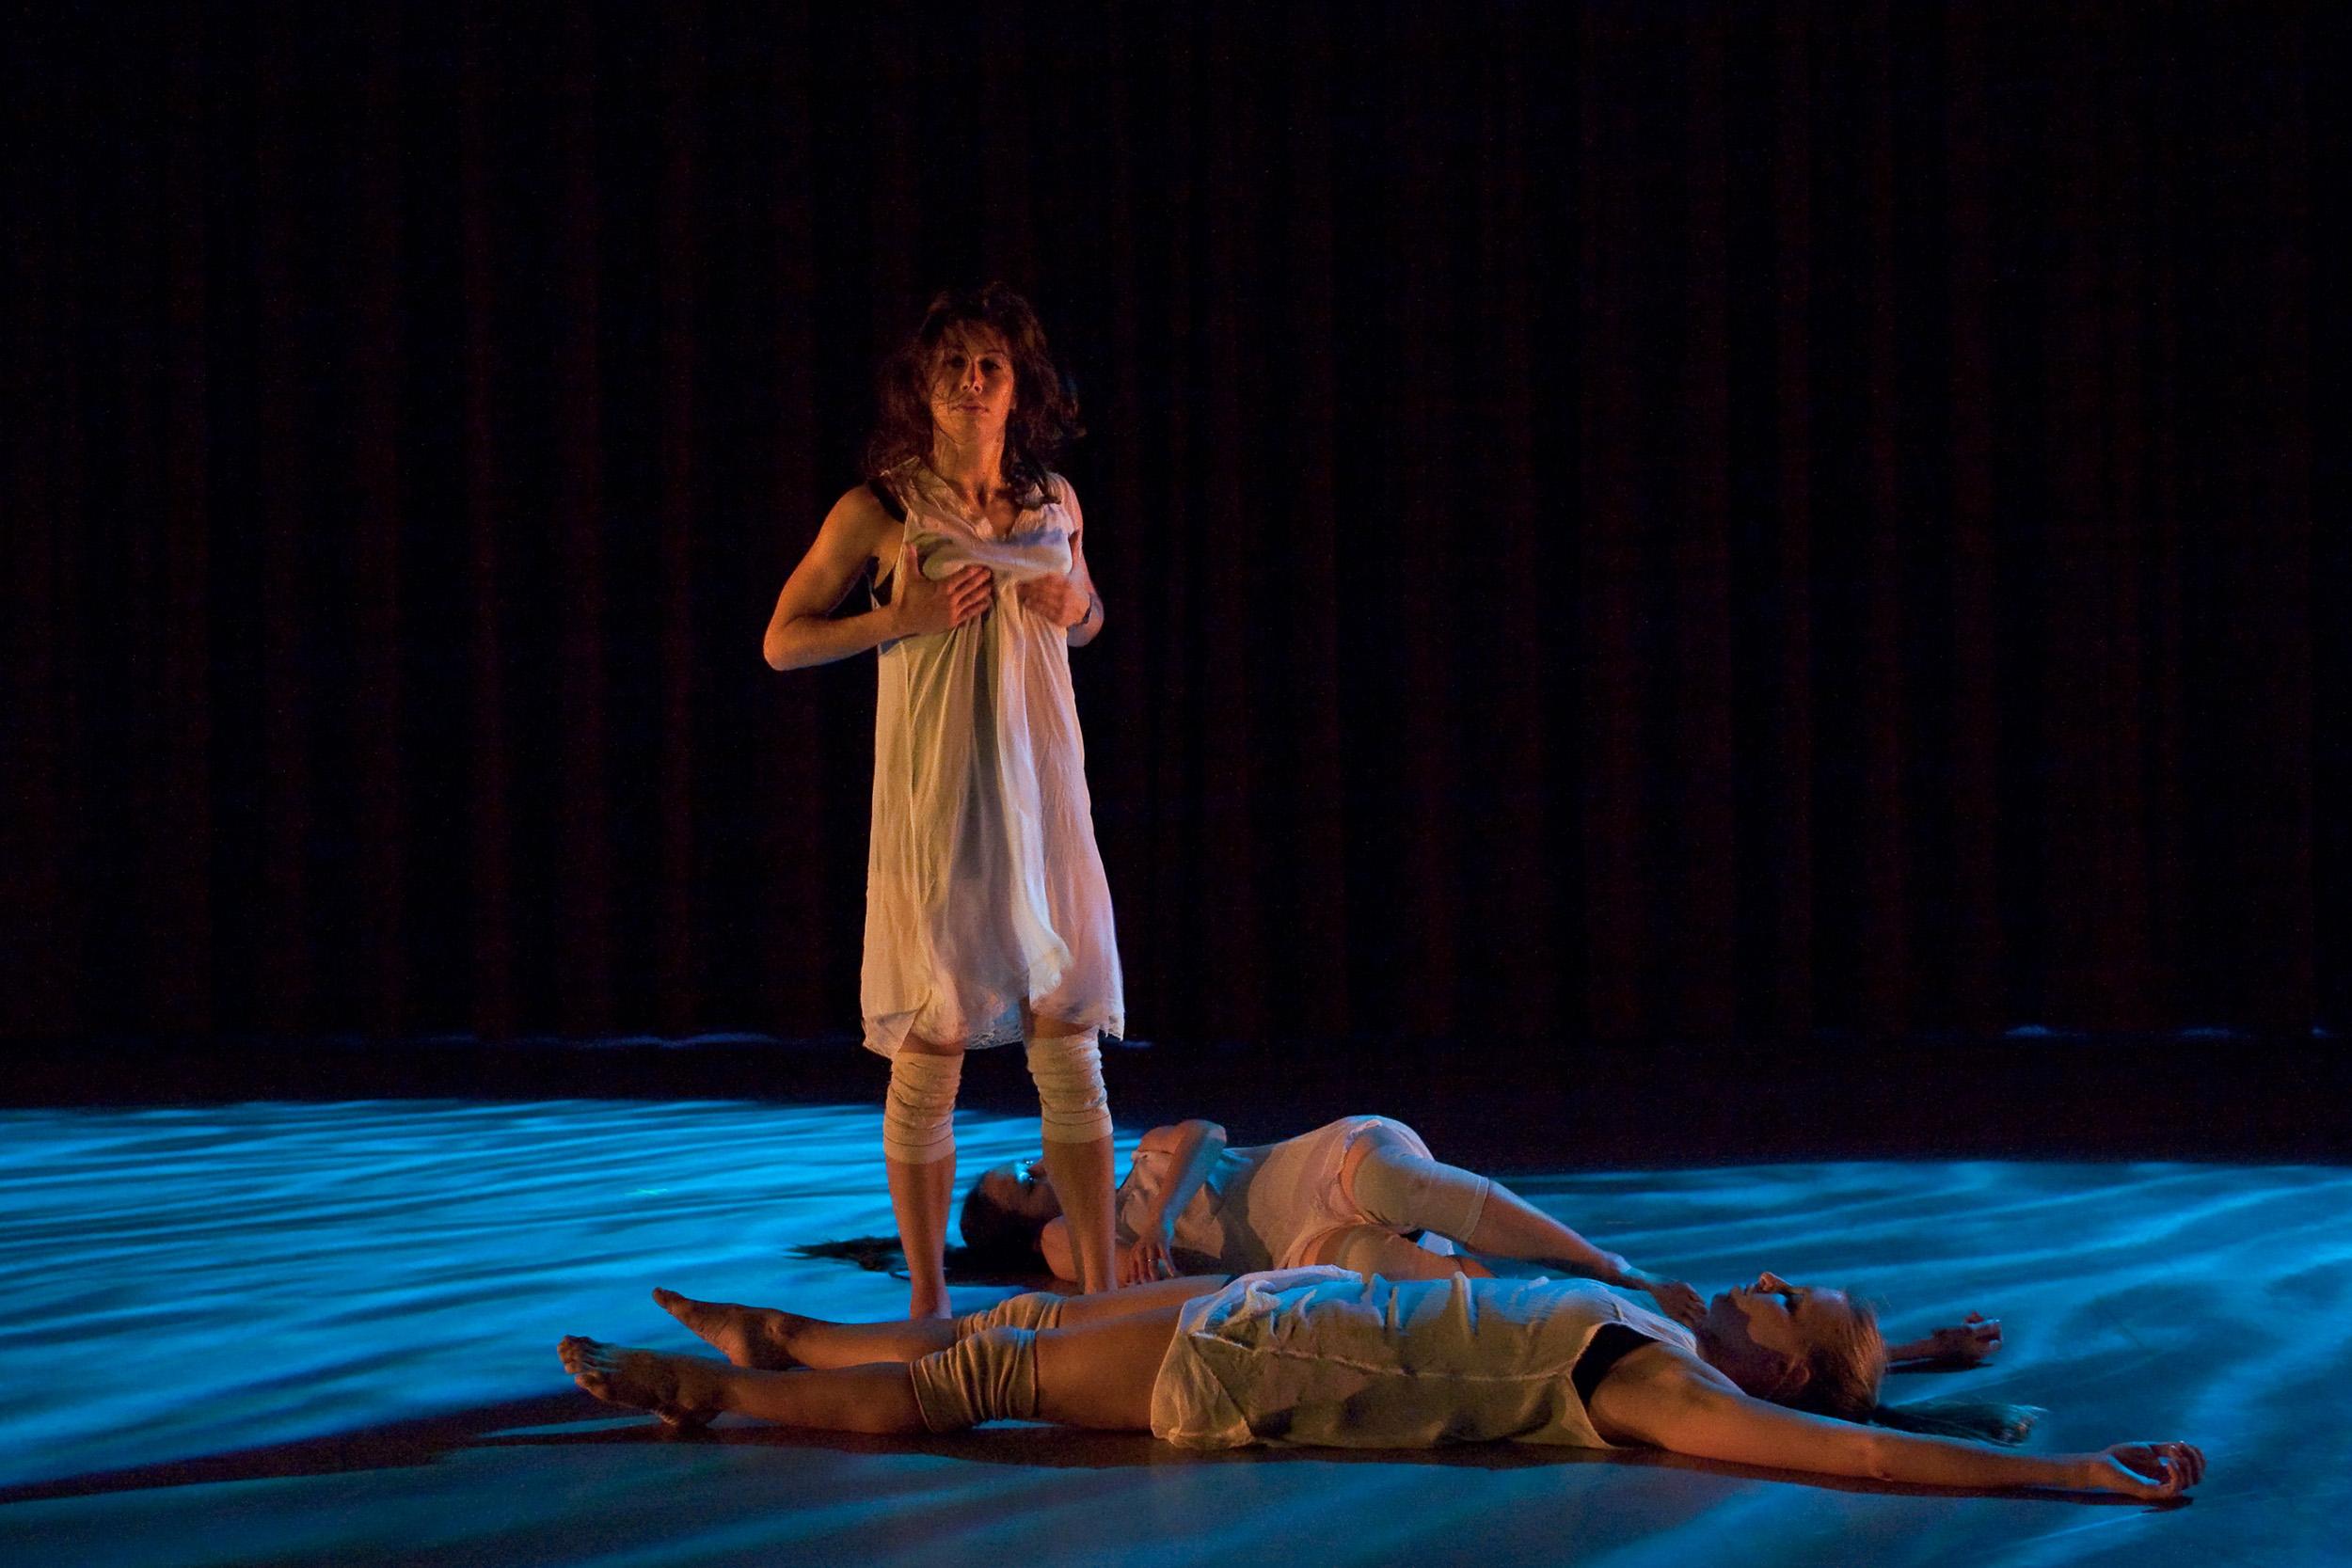 pluto-anne-bleuthenthal-allen-willner-lighting-dancers.jpg